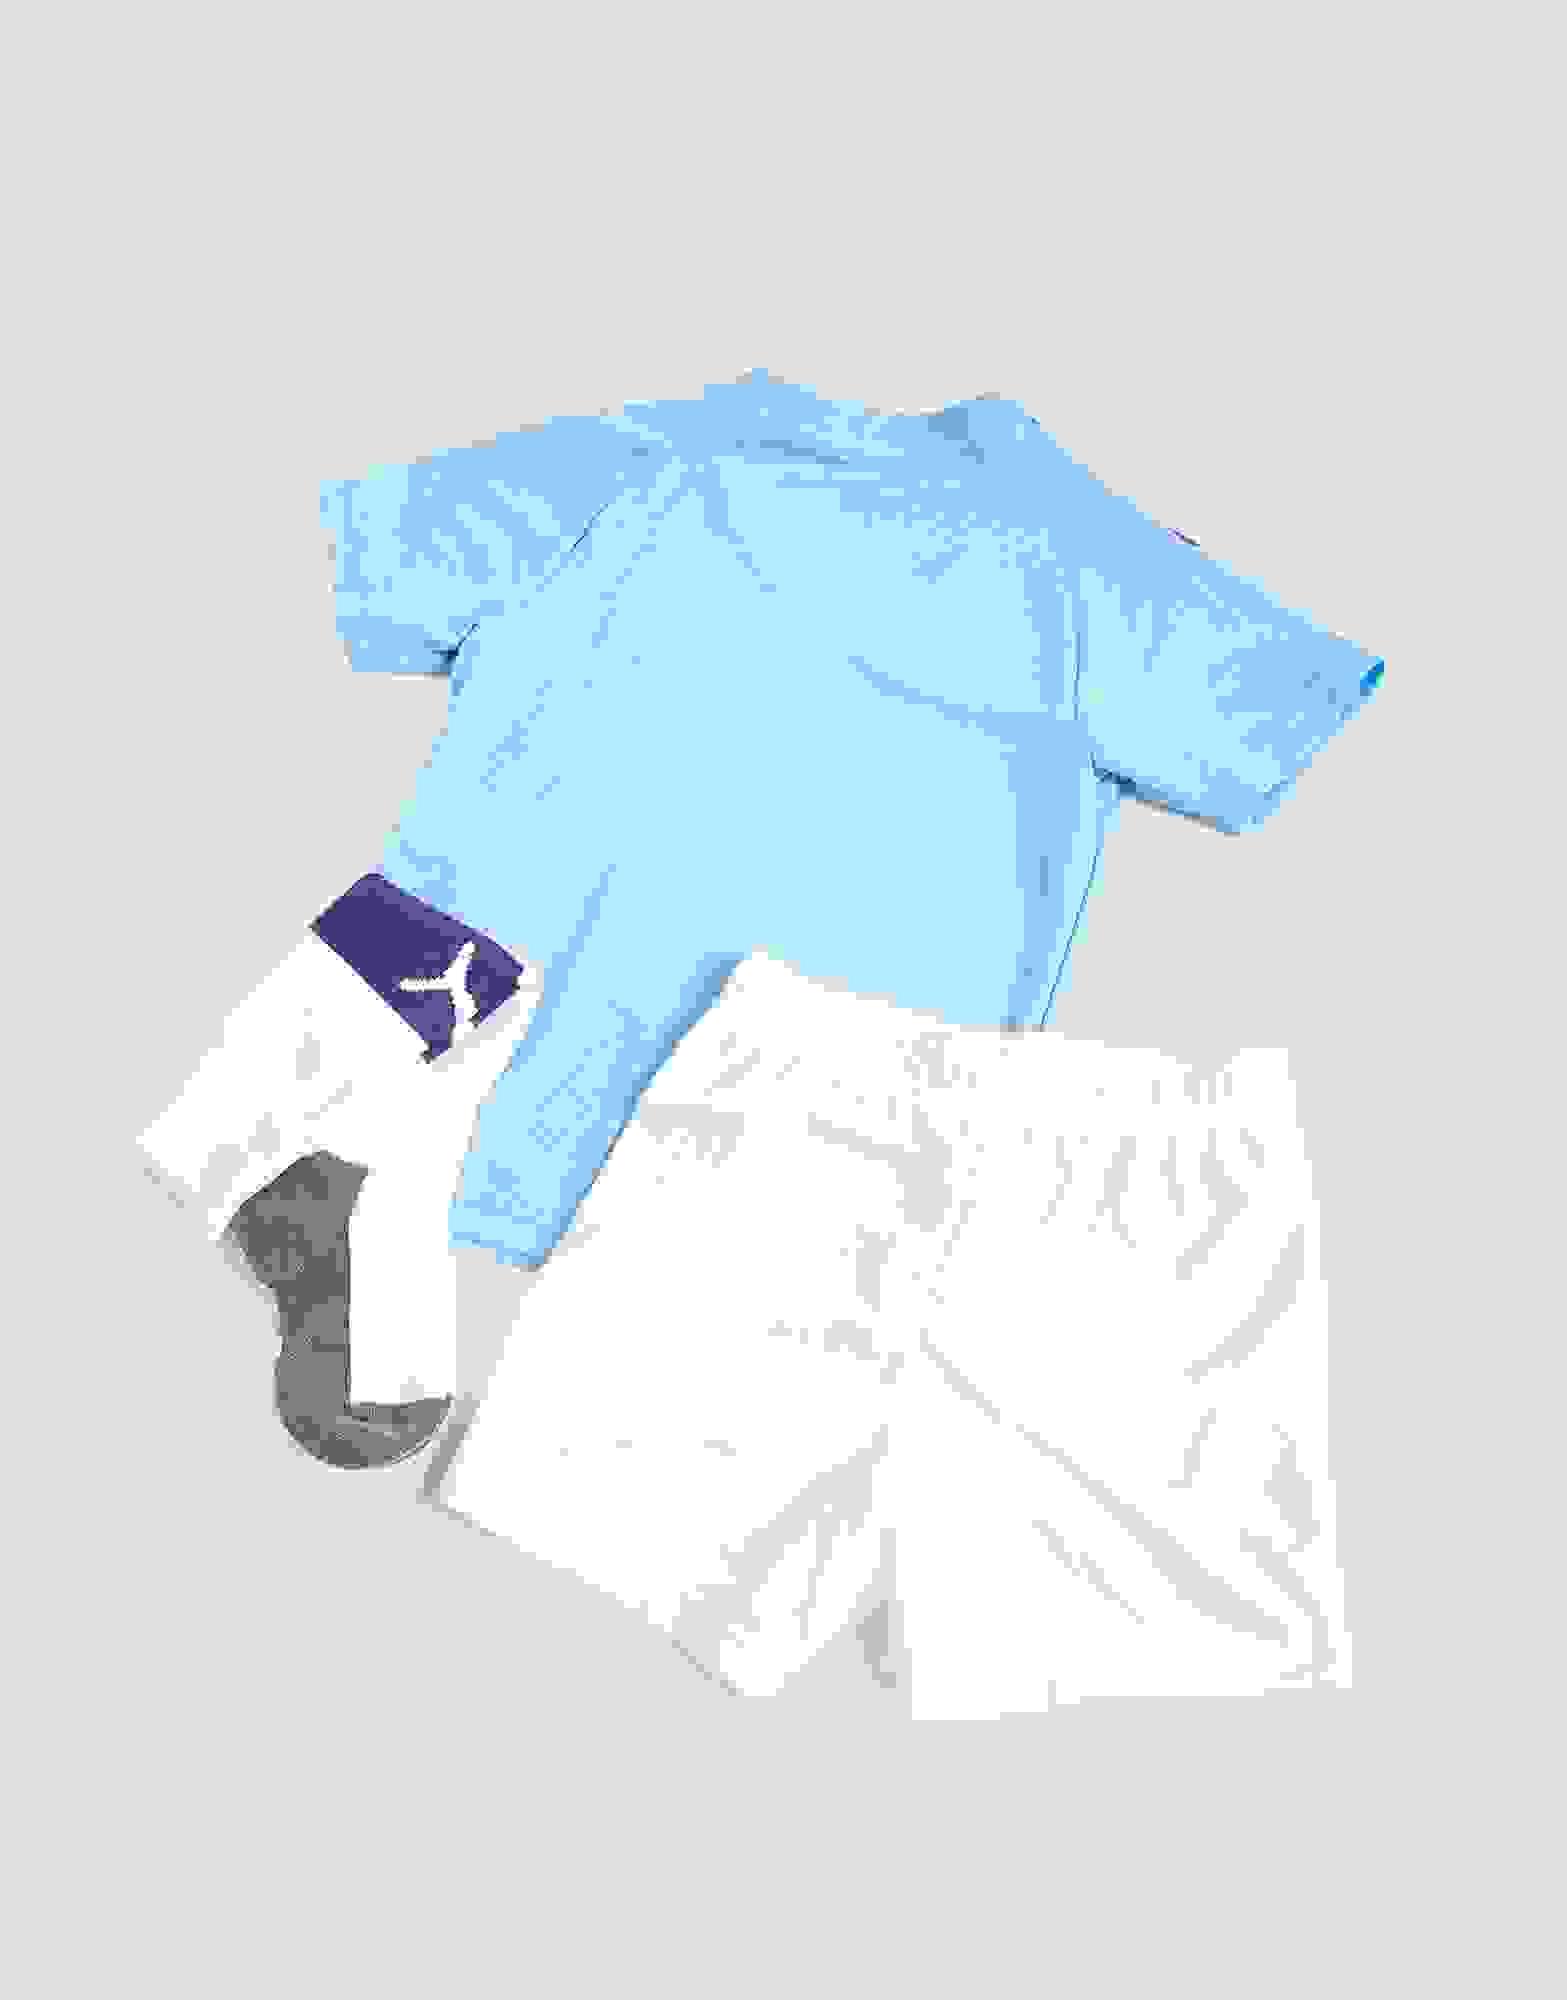 Knicks Malla Bordada Aficionados Swingman Jerseys Shorts Respirable Y Usable YSPORT Shorts Baloncesto Color : Blue, Size : S